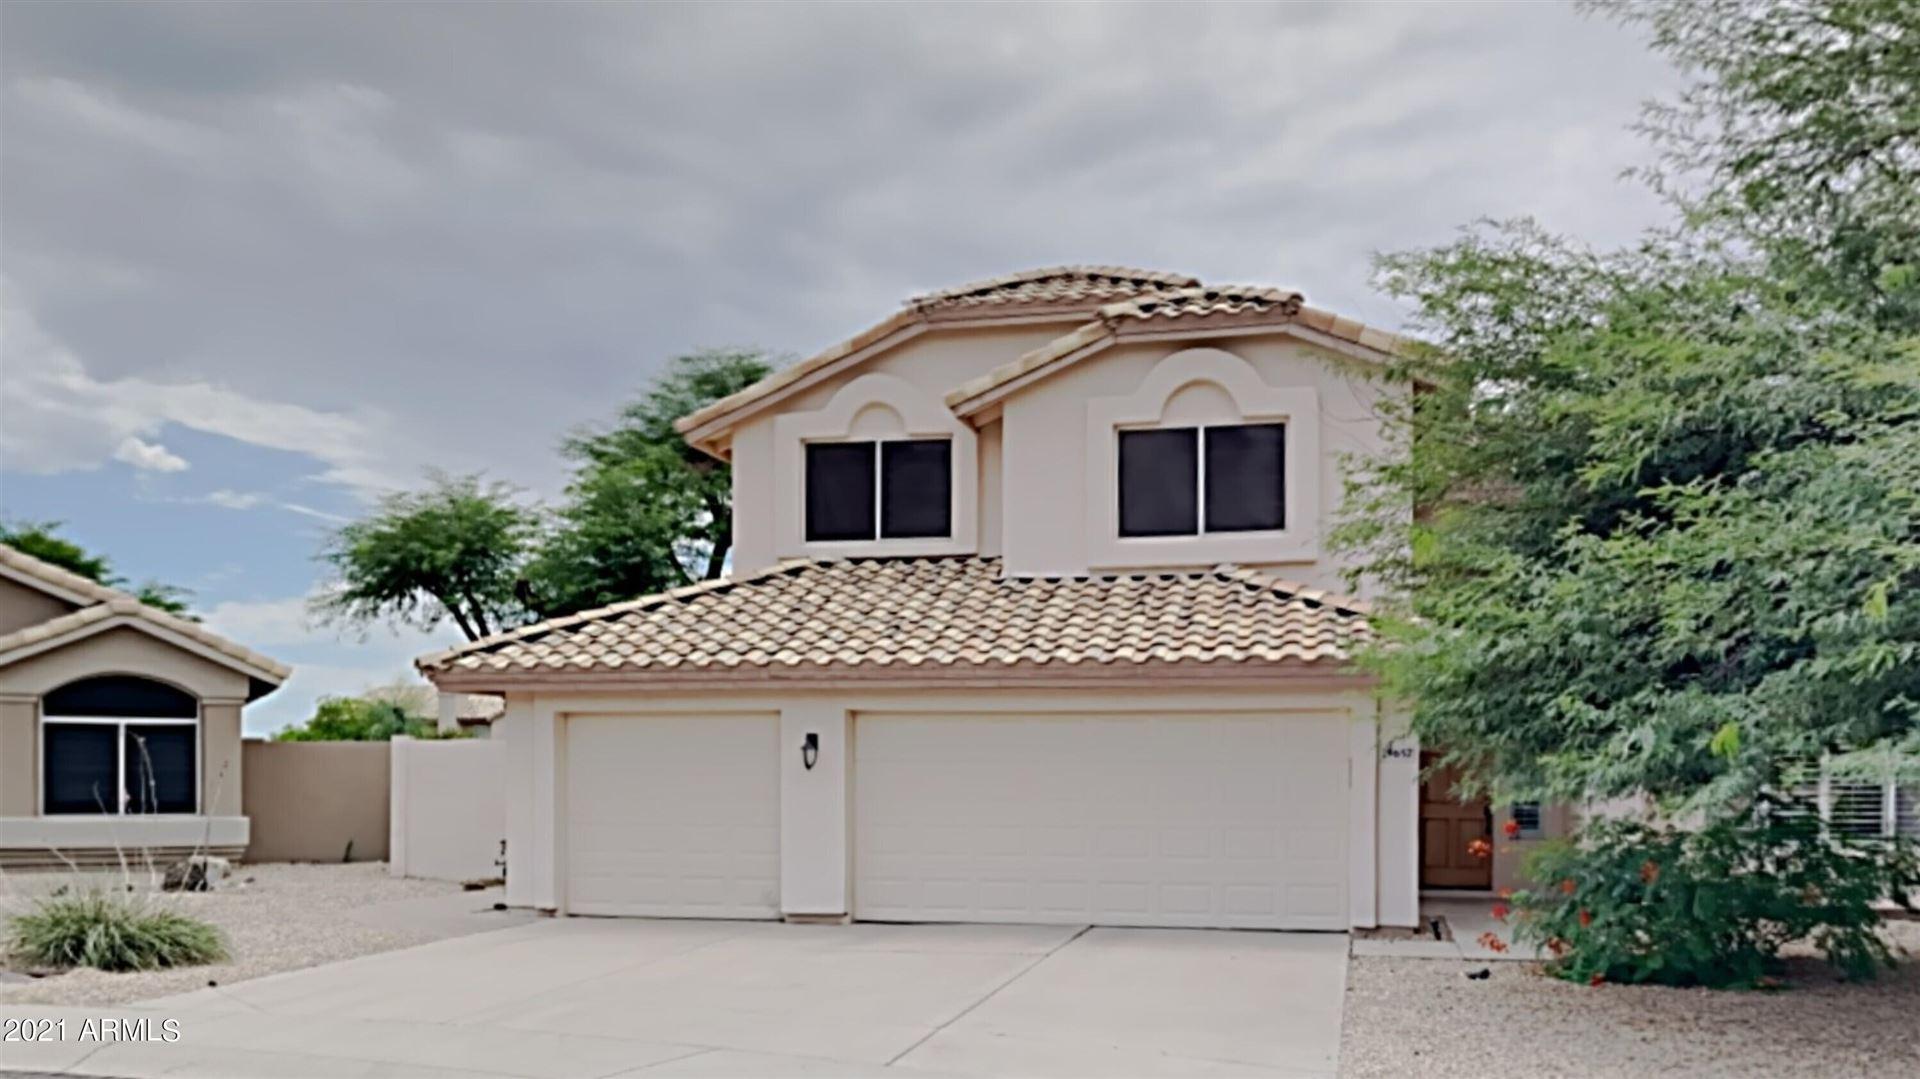 Photo of 29657 N 45th Street, Cave Creek, AZ 85331 (MLS # 6290600)